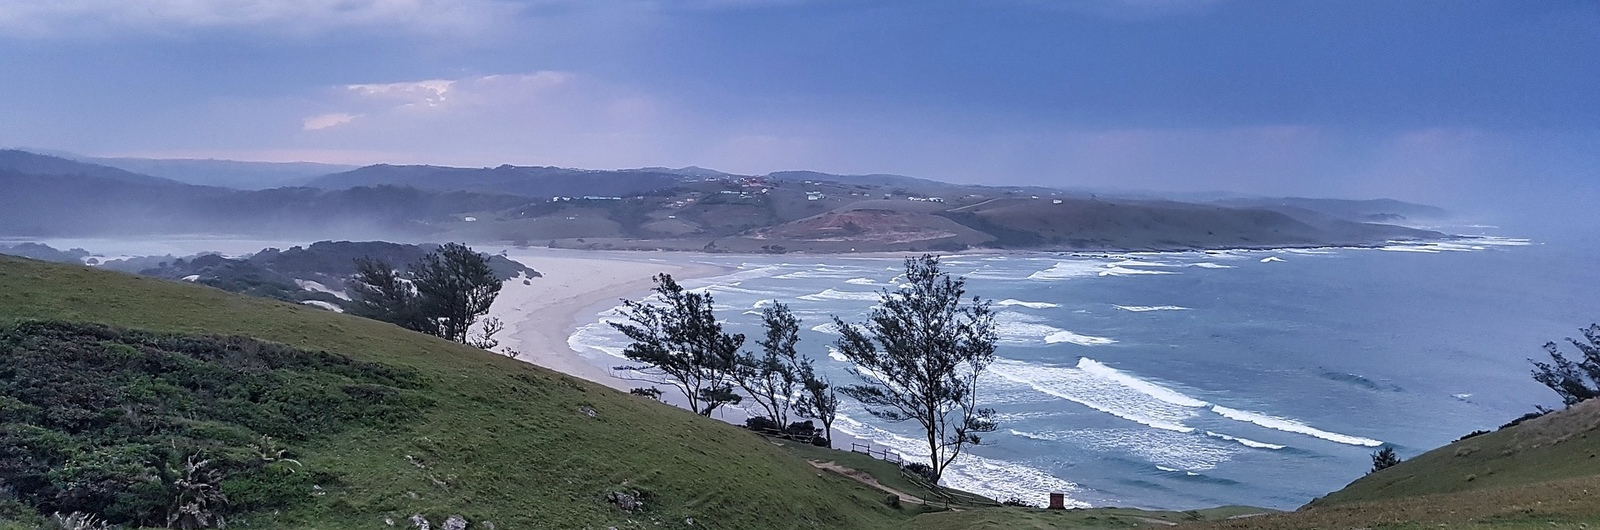 city header southafrica beach coast